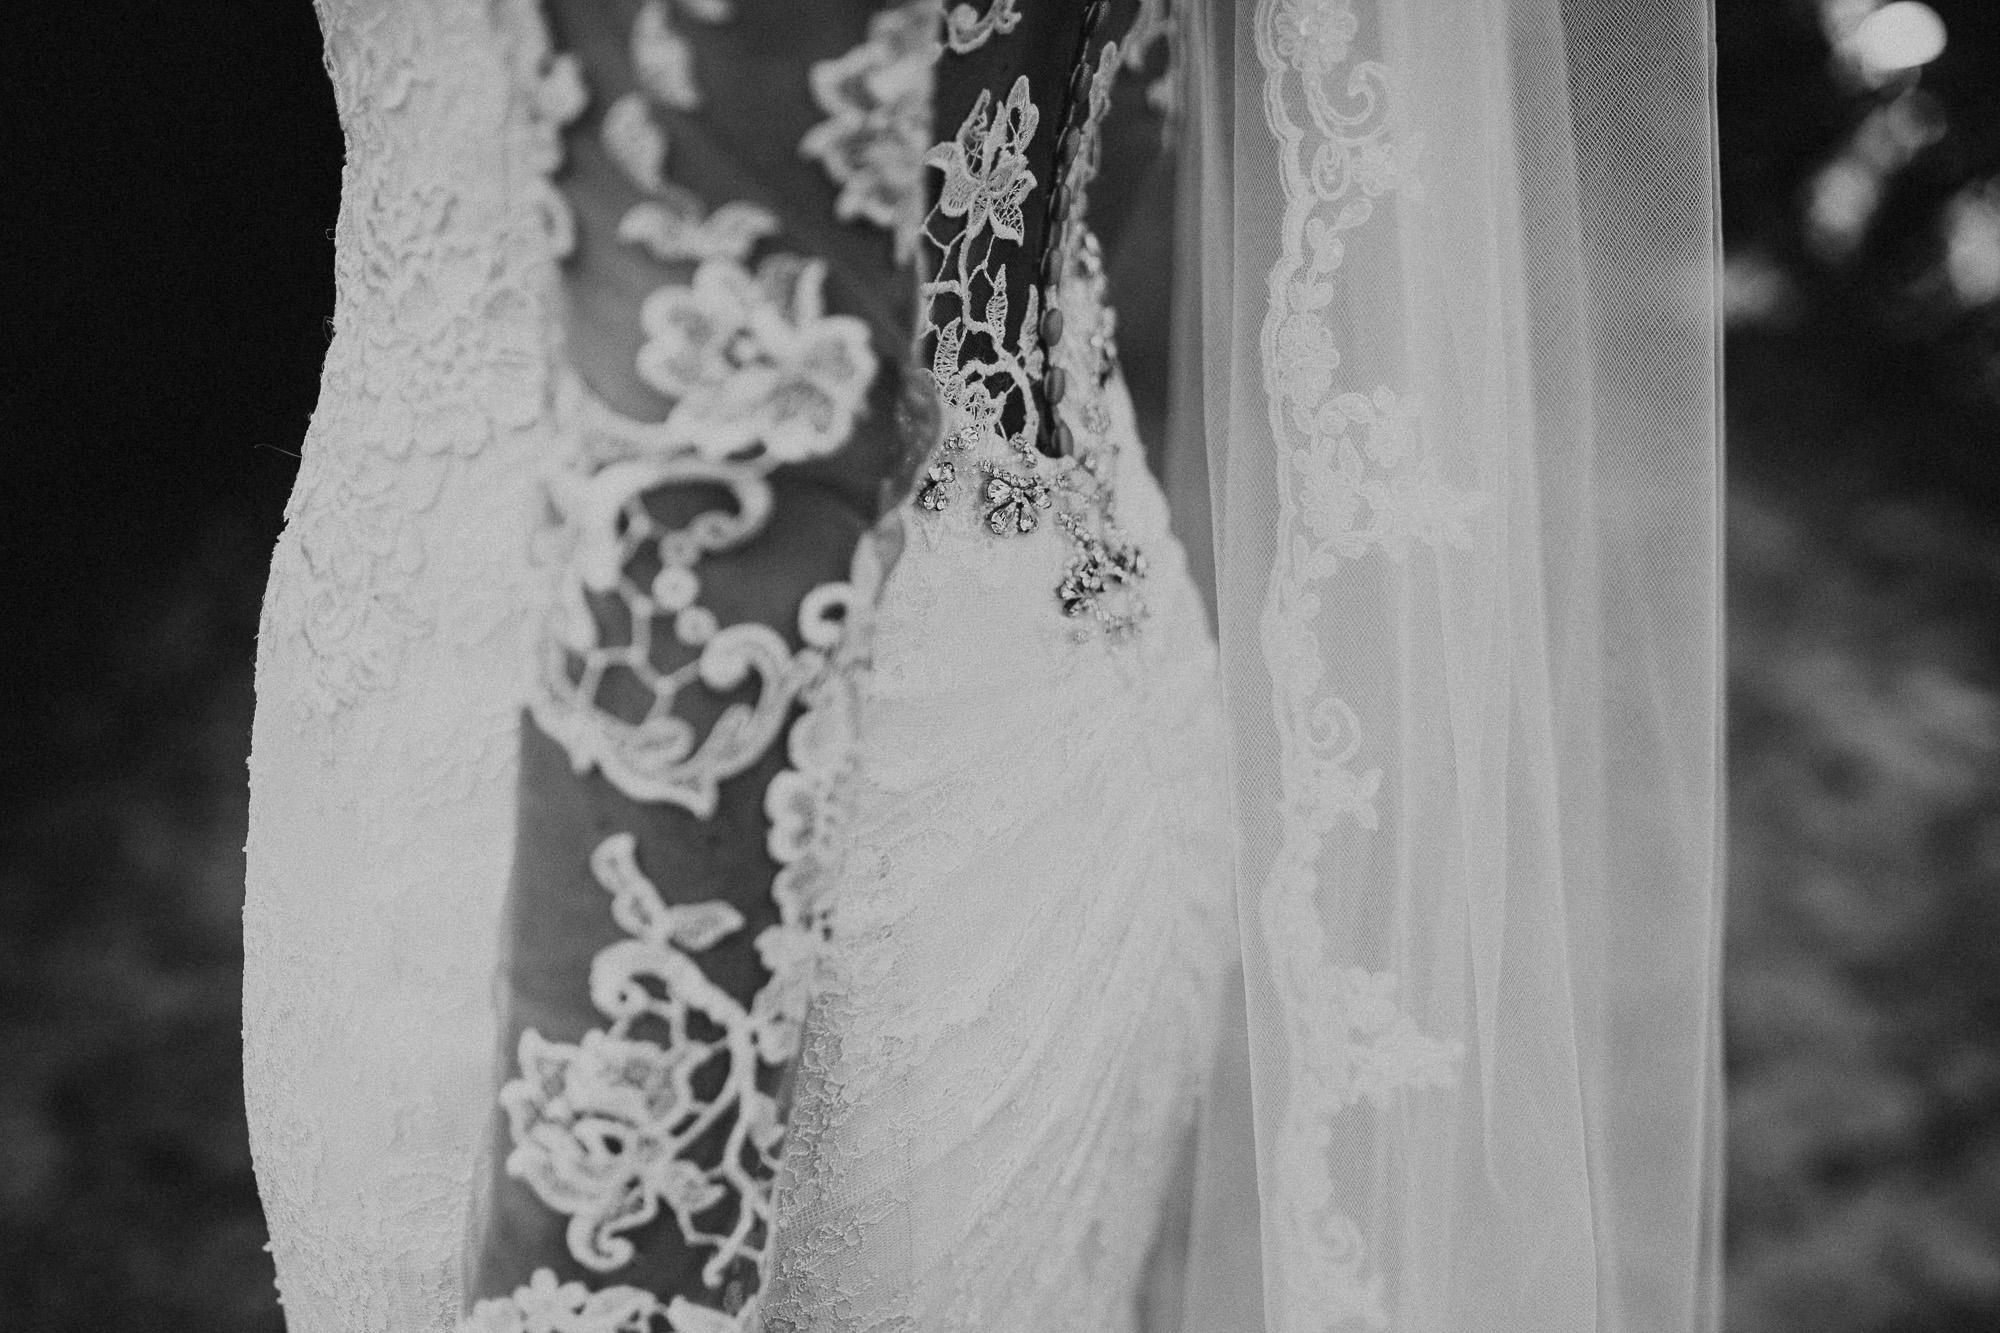 DanielaMarquardtPhotography_Hochzeitsfotograf_Düsseldorf_Köln_Mallorca_Bayern_Austria_Harz_Coupleshoot_AileenundLennart_Weddingphotographer_Ibiza_Tuskany_Italien_Toskana_Portugal_Lissabon64